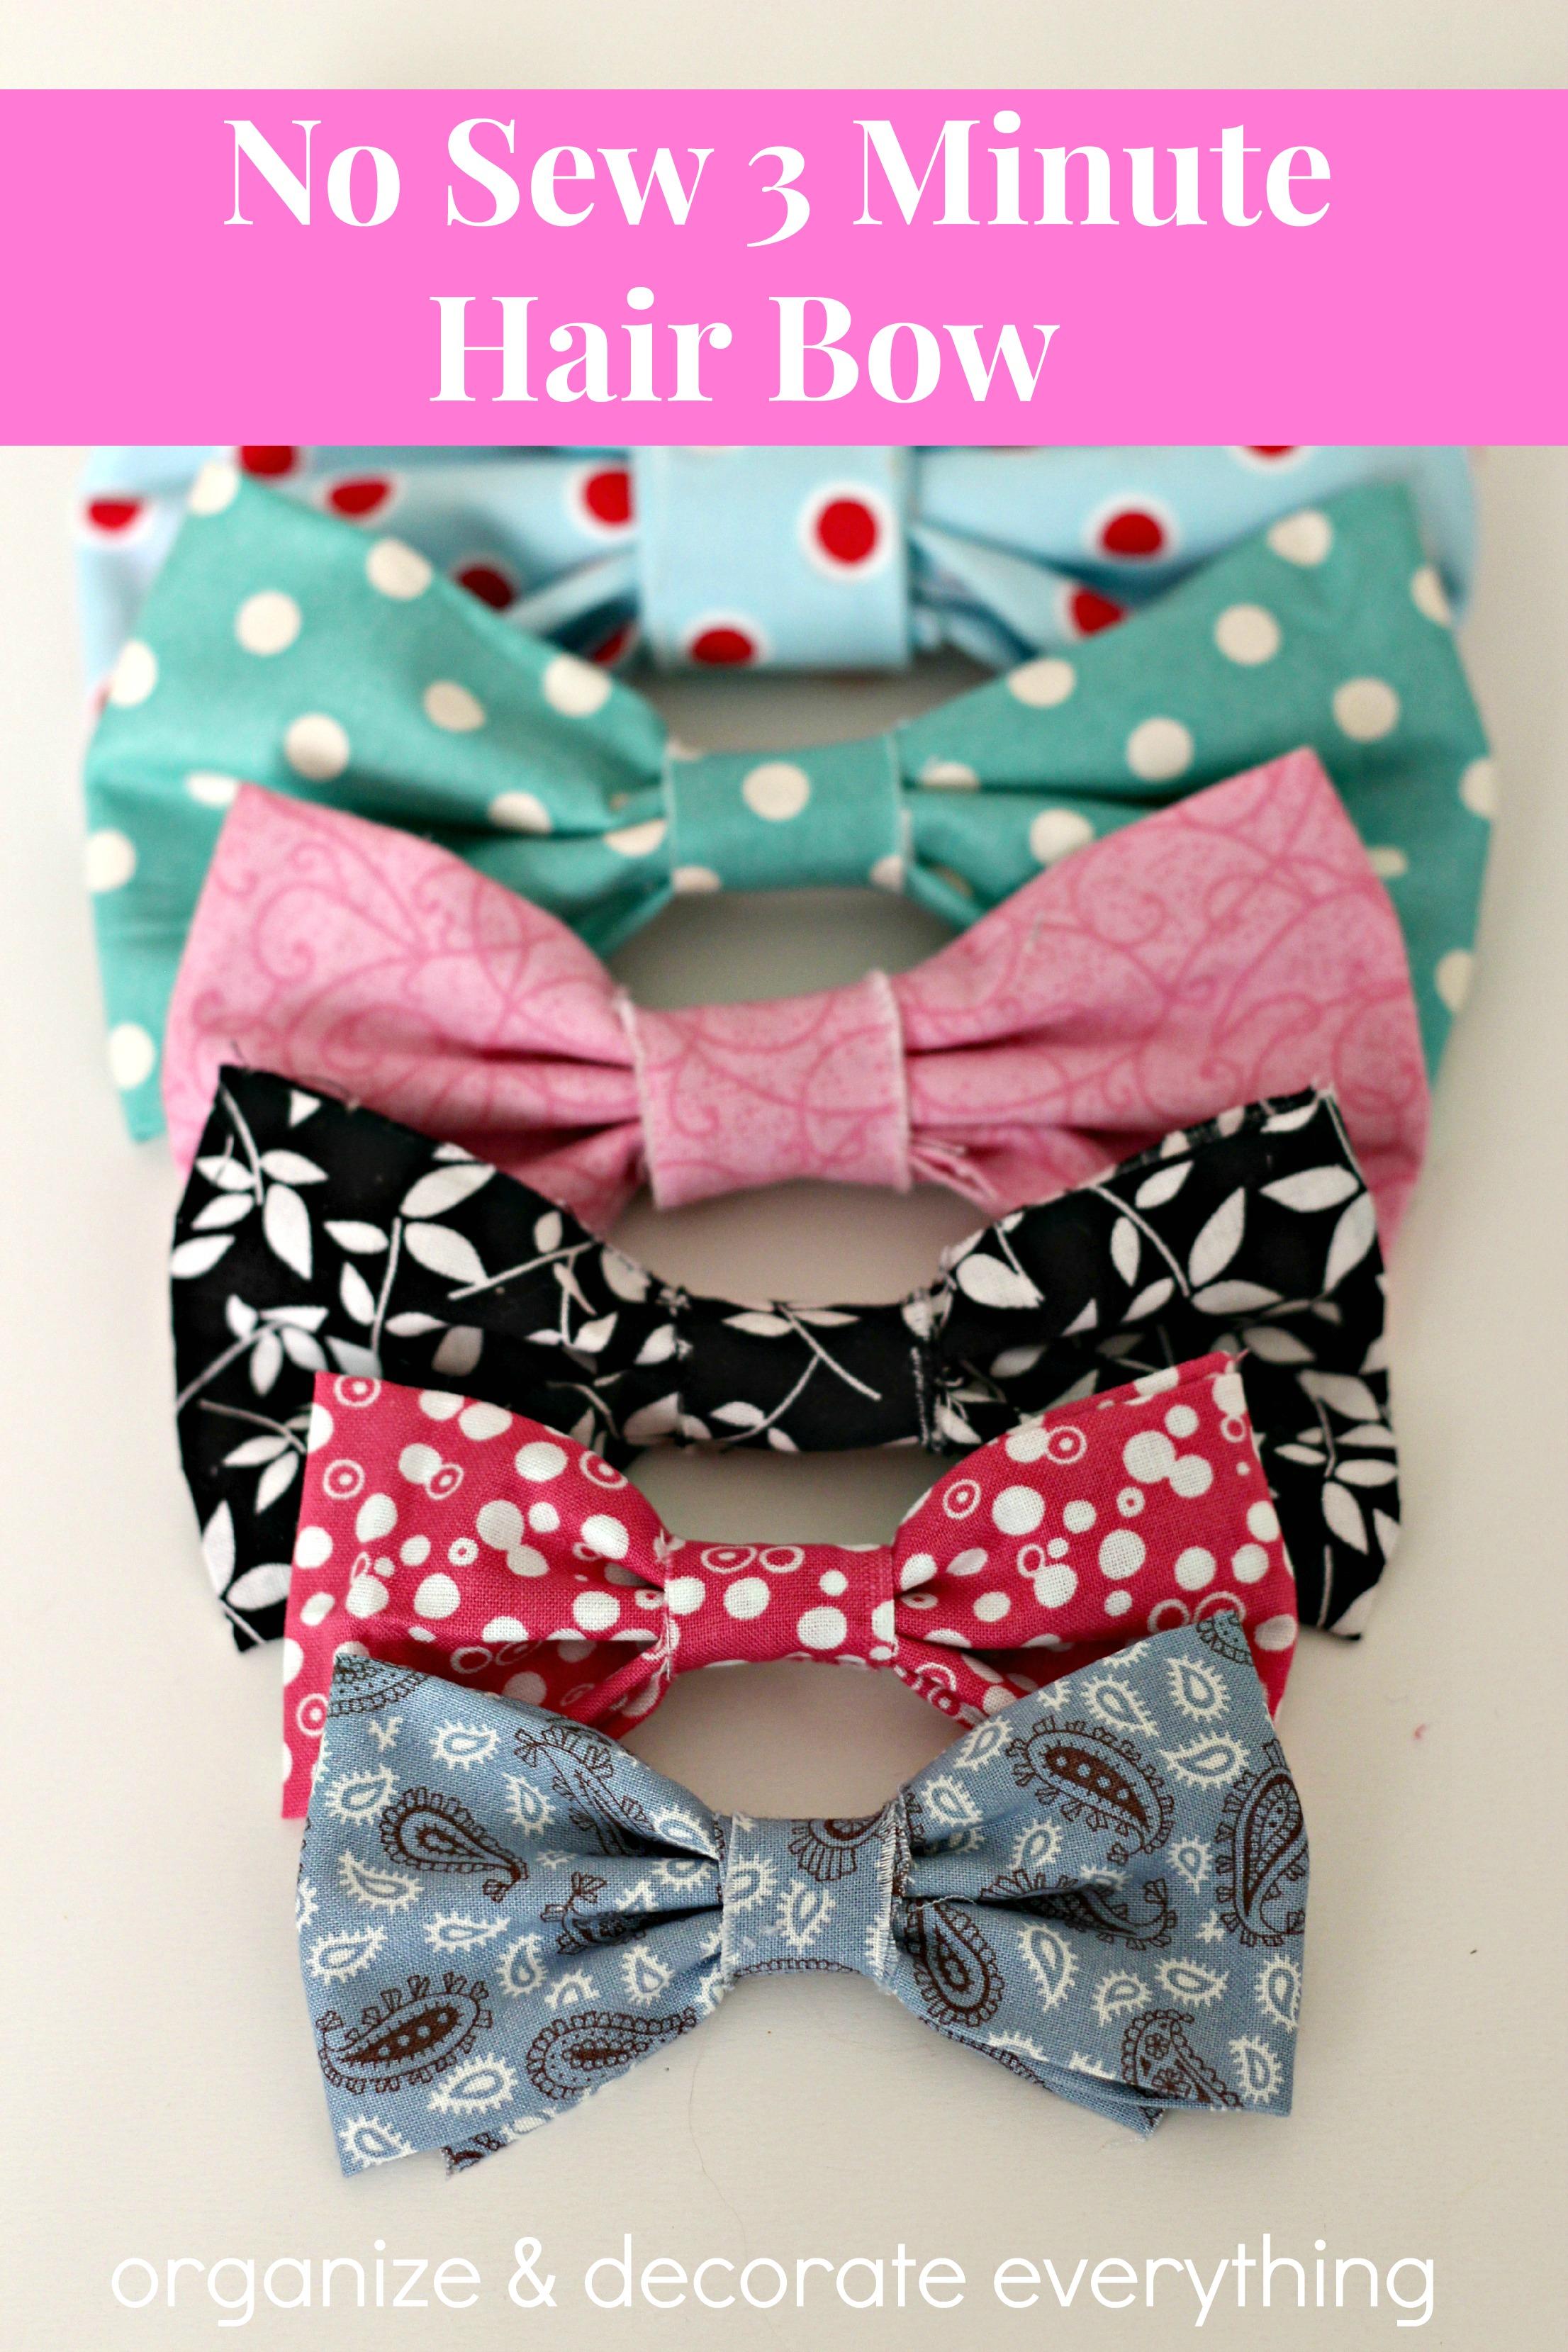 How to organize hair bows - No Sew 3 Minute Hair Bow 1